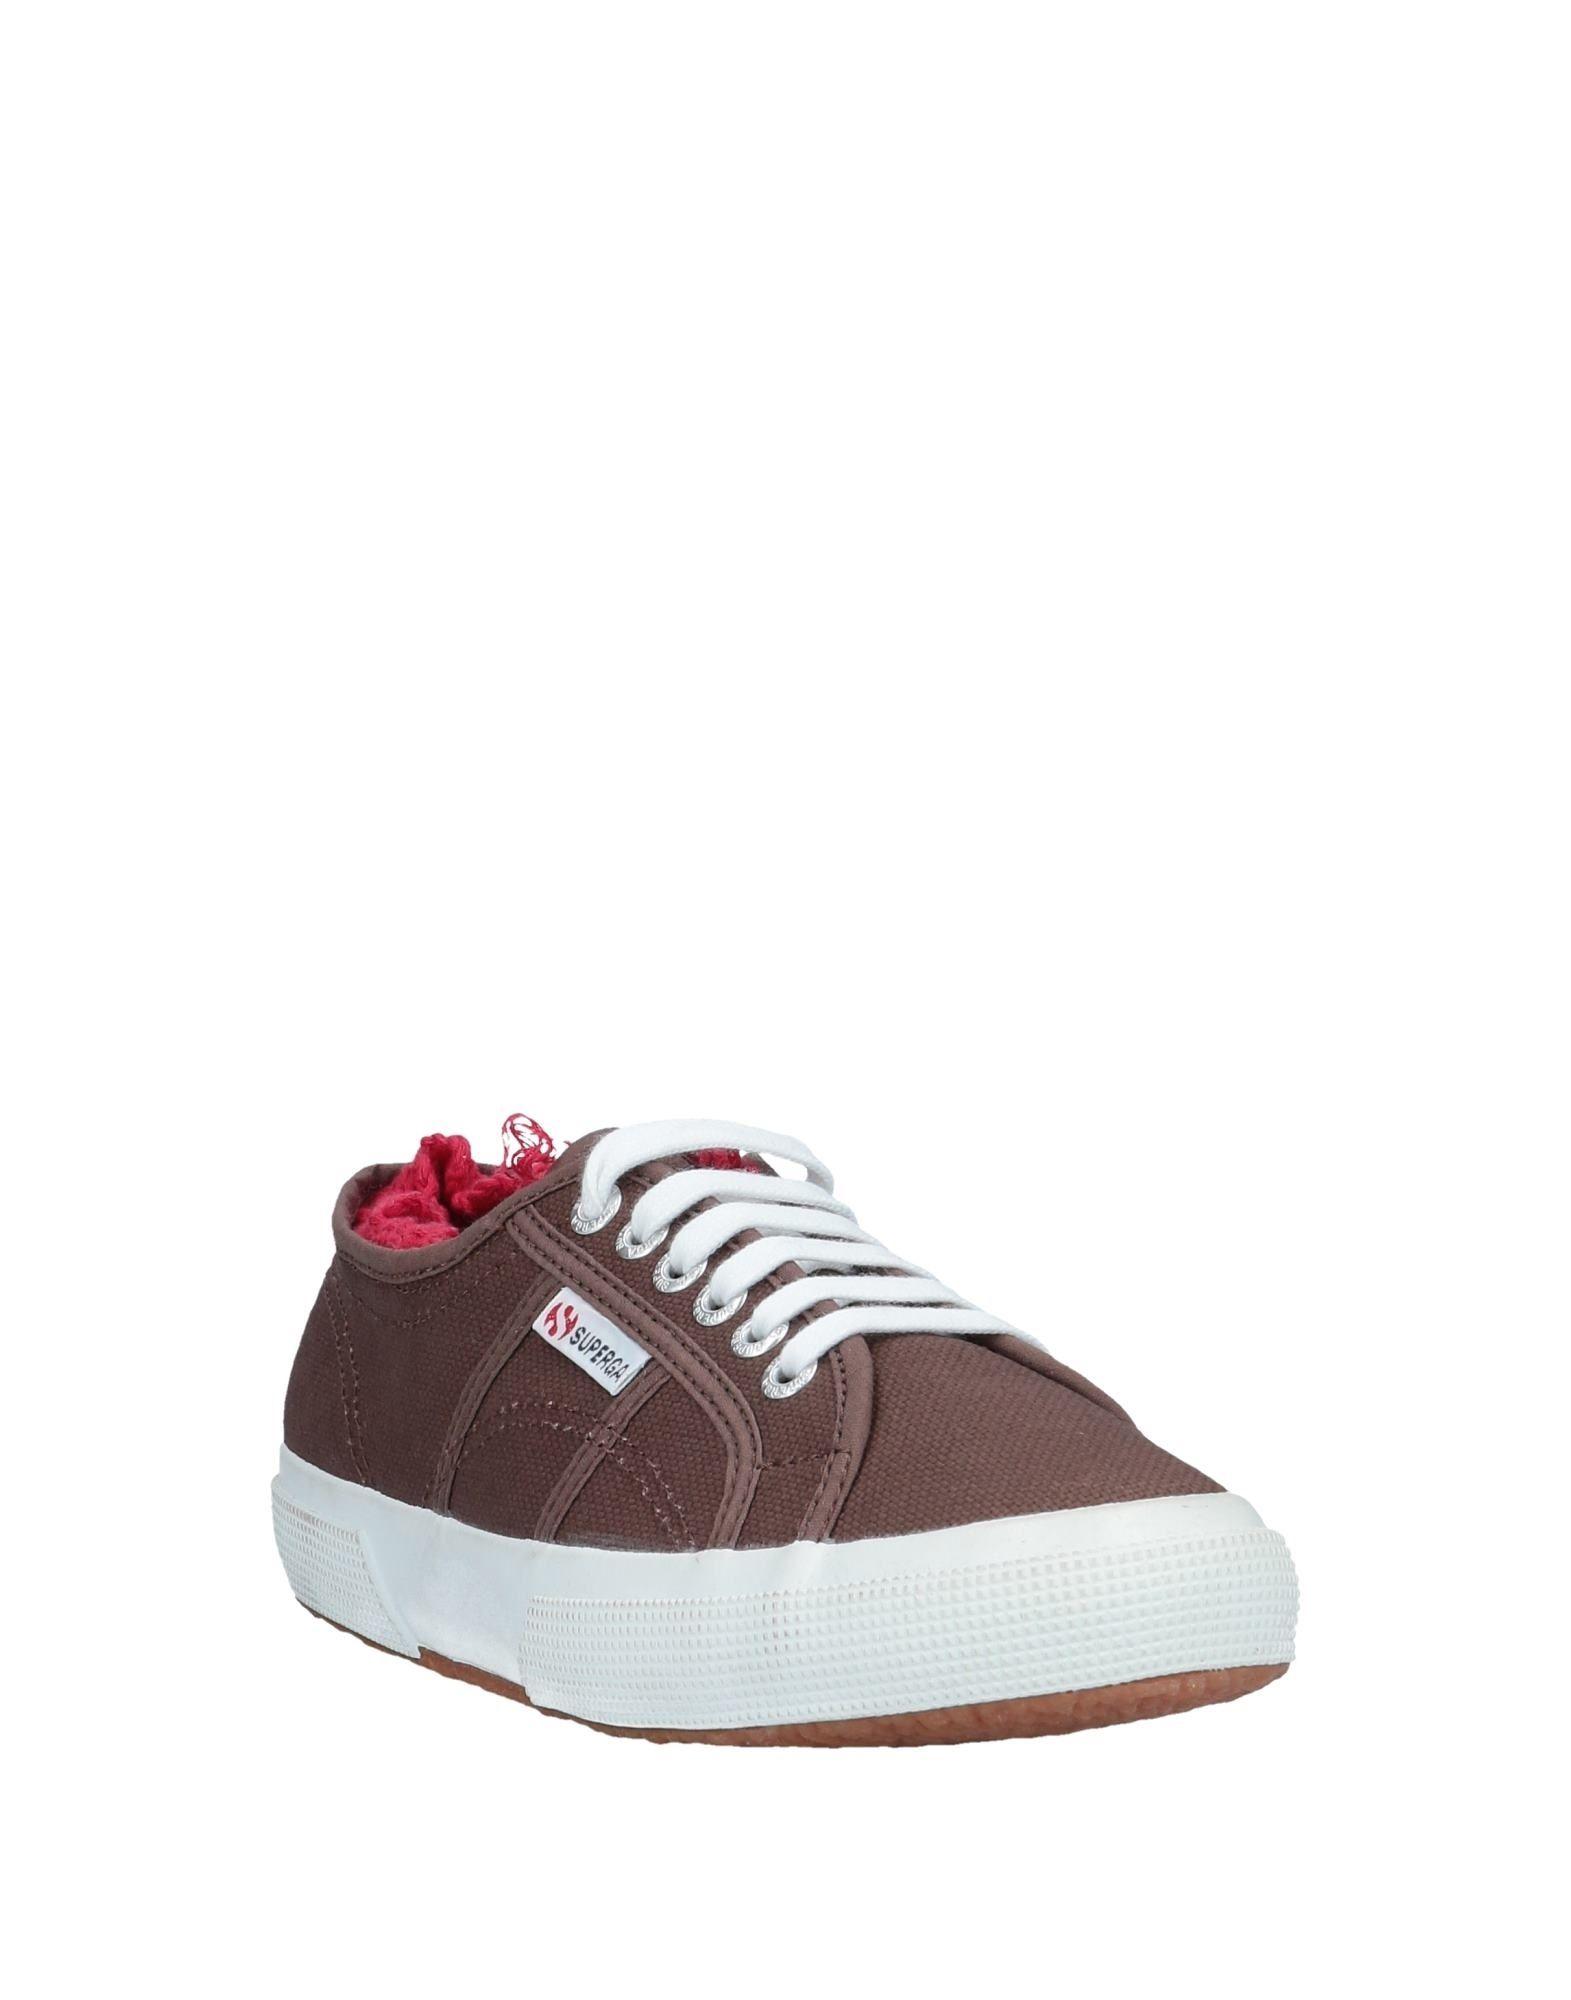 Superga® For Gute Pinko Uniqueness Turnschuhes Damen 11560573ME Gute For Qualität beliebte Schuhe 26d824